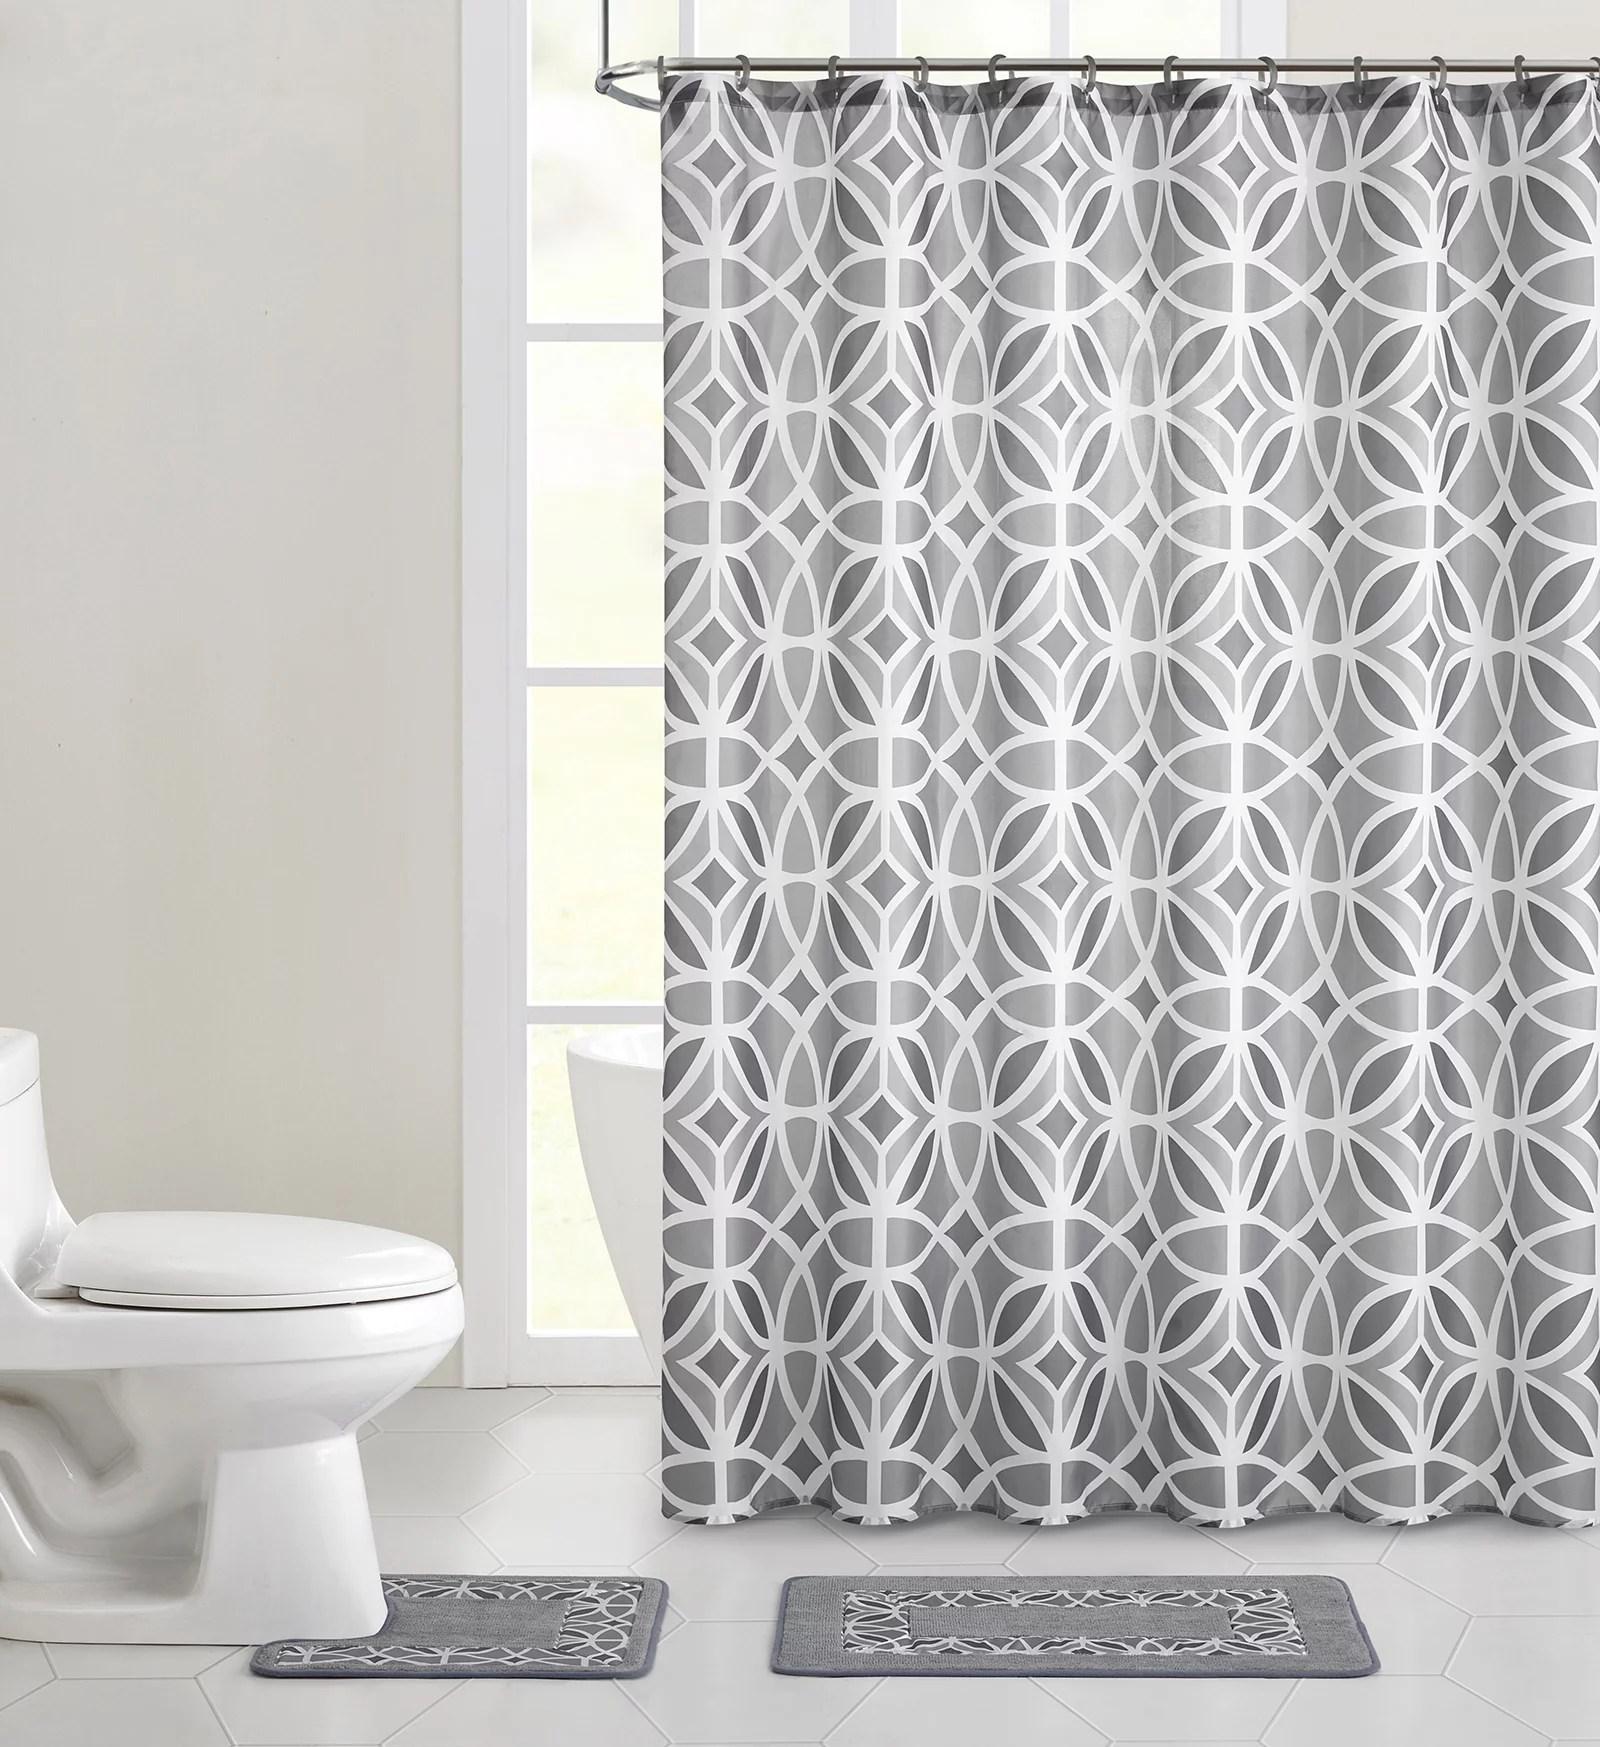 mainstays aster geometric polyester shower curtain bath set grey 15 pieces